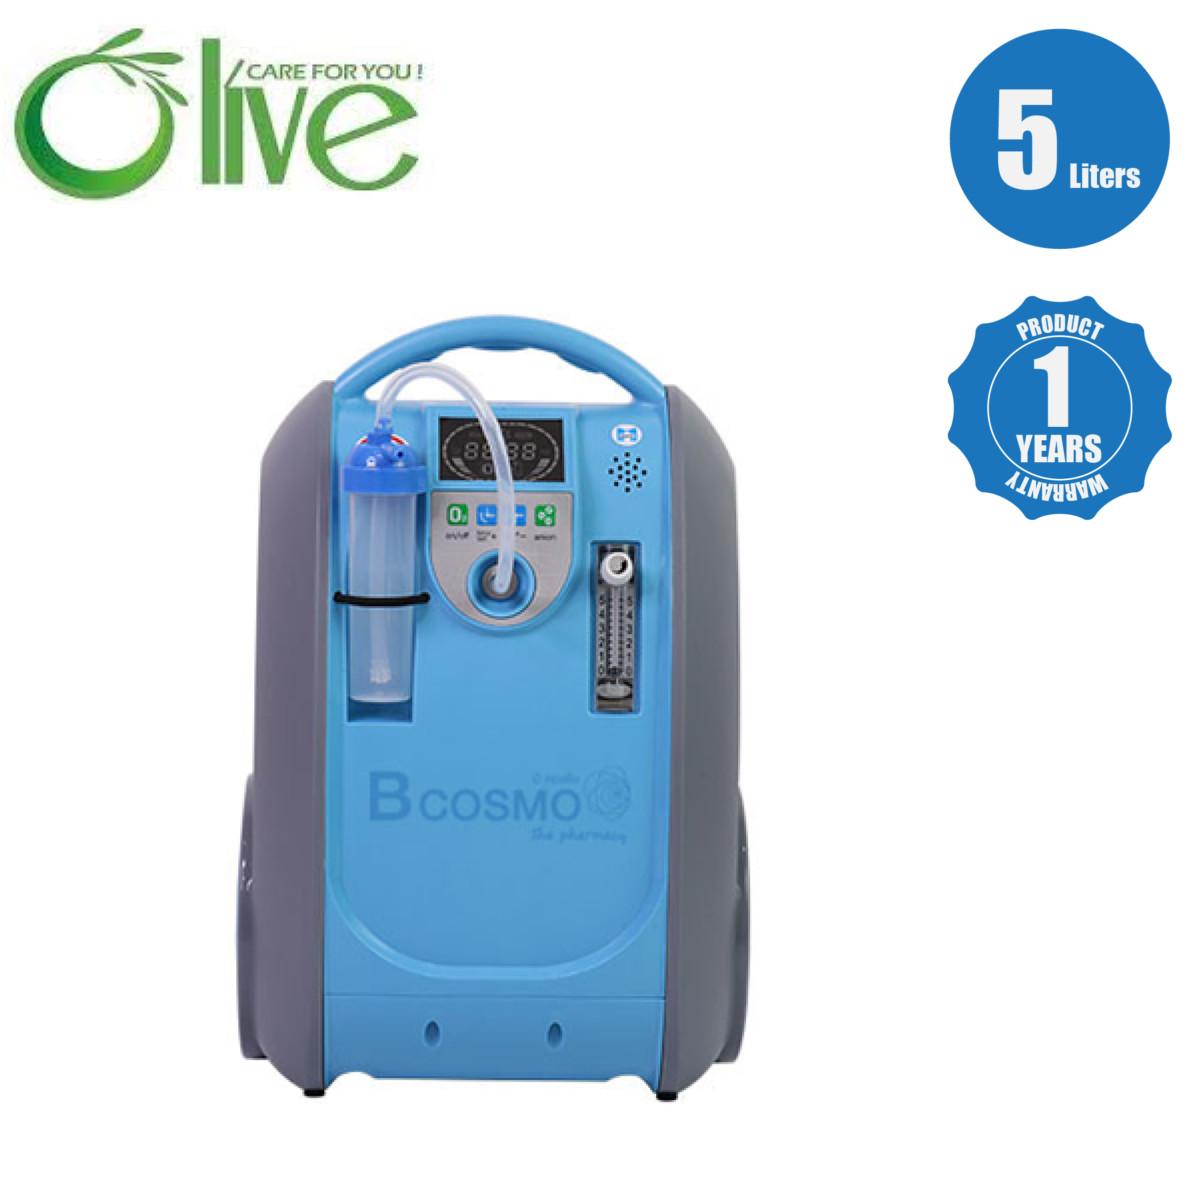 -OLIVE-B-1-5l. ชุดเครื่องผลิตออกซิเจนรุ่นพกพา OLIVE B-1 5l.